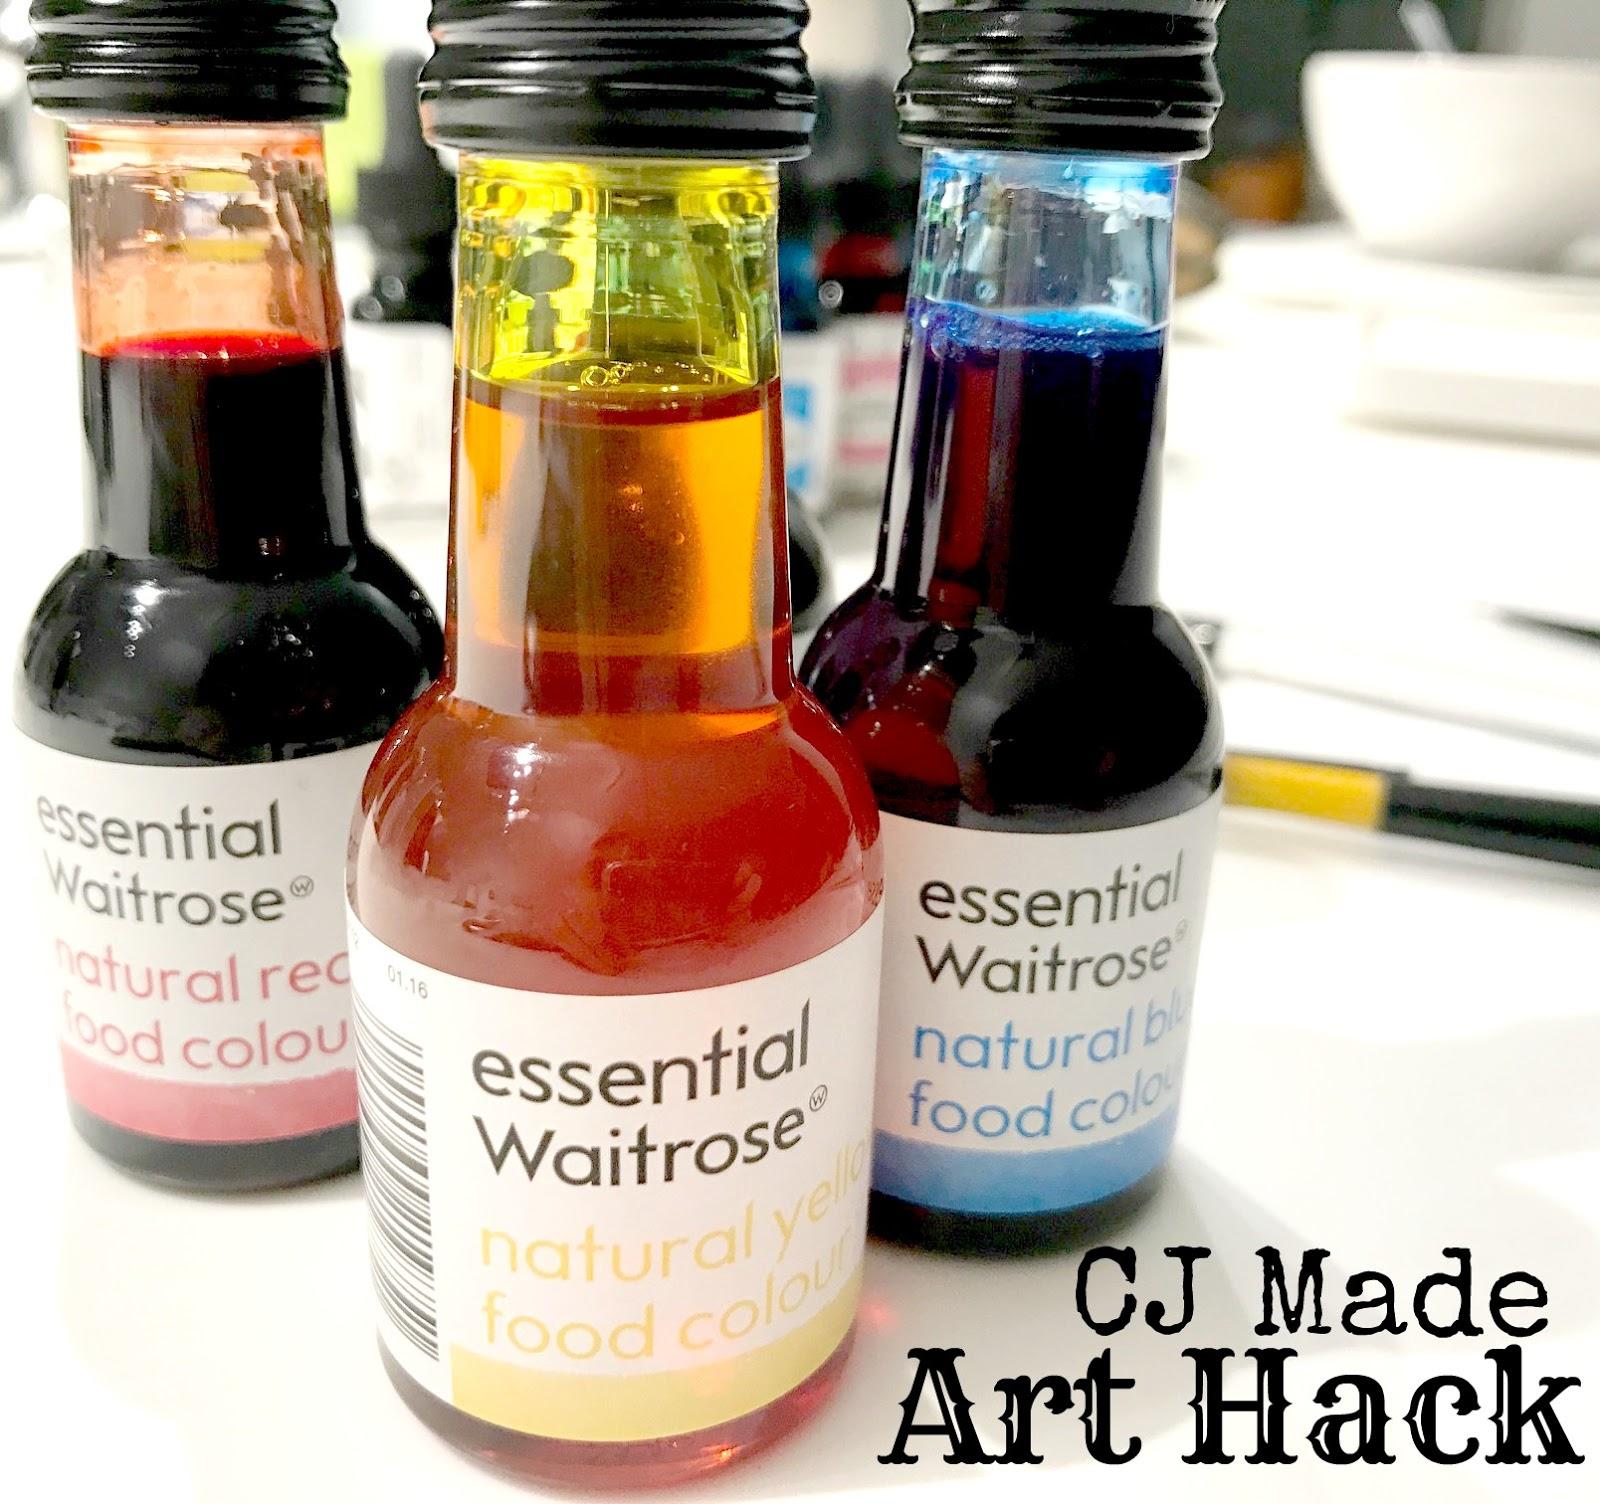 CJ made: Art Hack: Inks versus Food Colouring